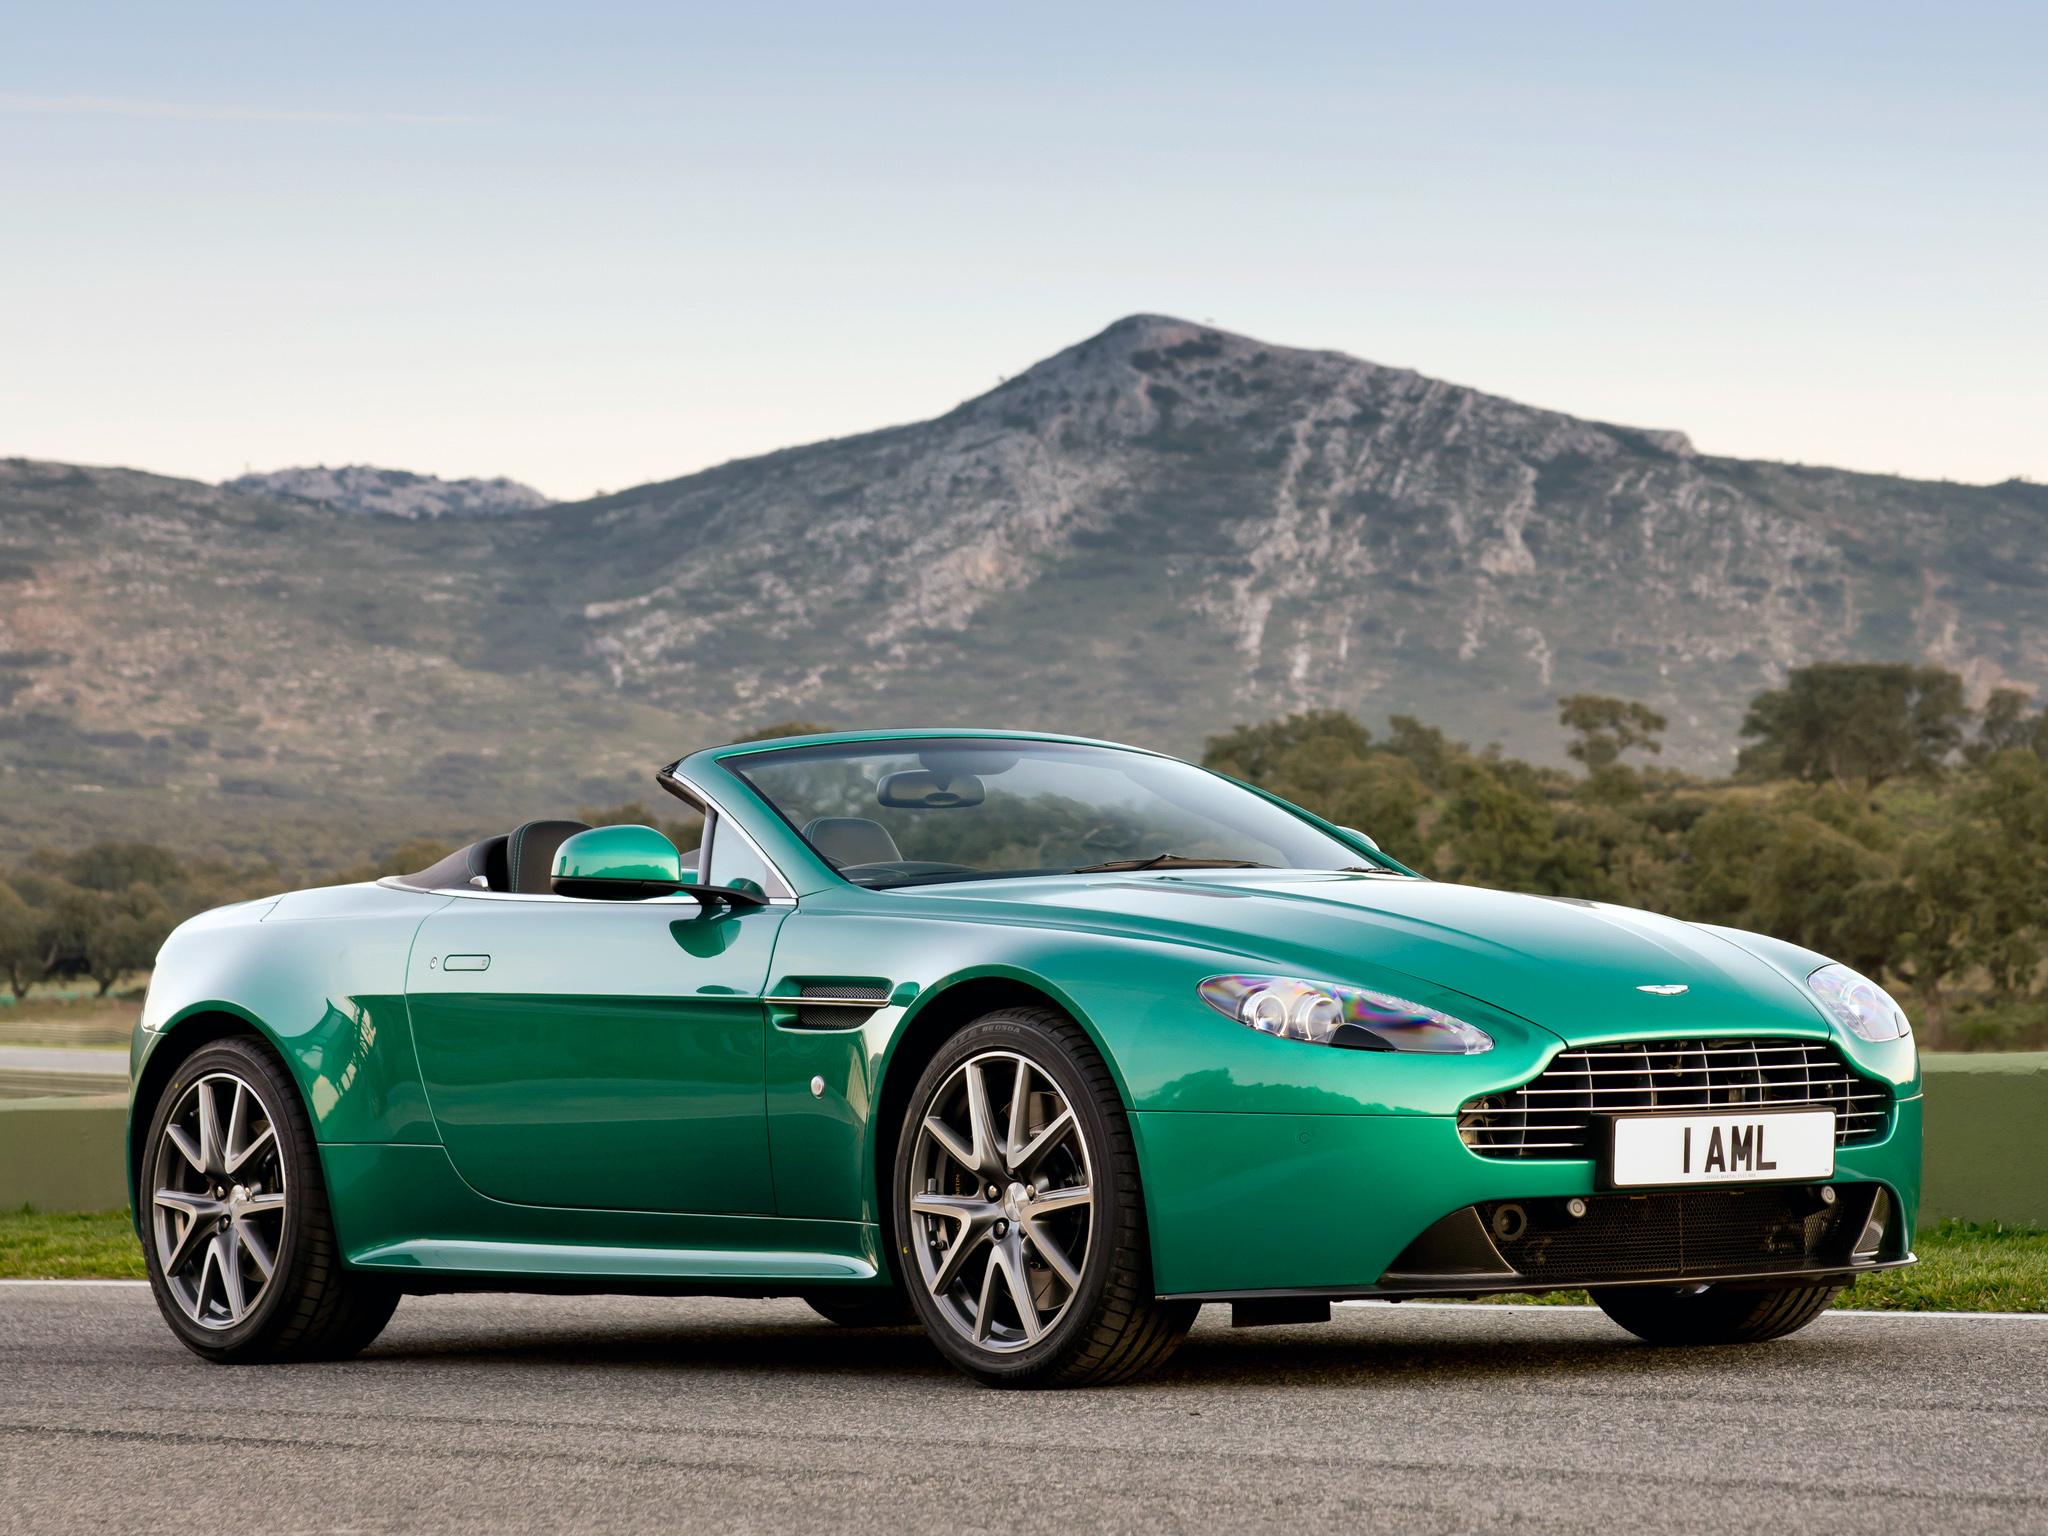 Aston Martin V8 Vantage S Roadster High Quality Background on Wallpapers Vista